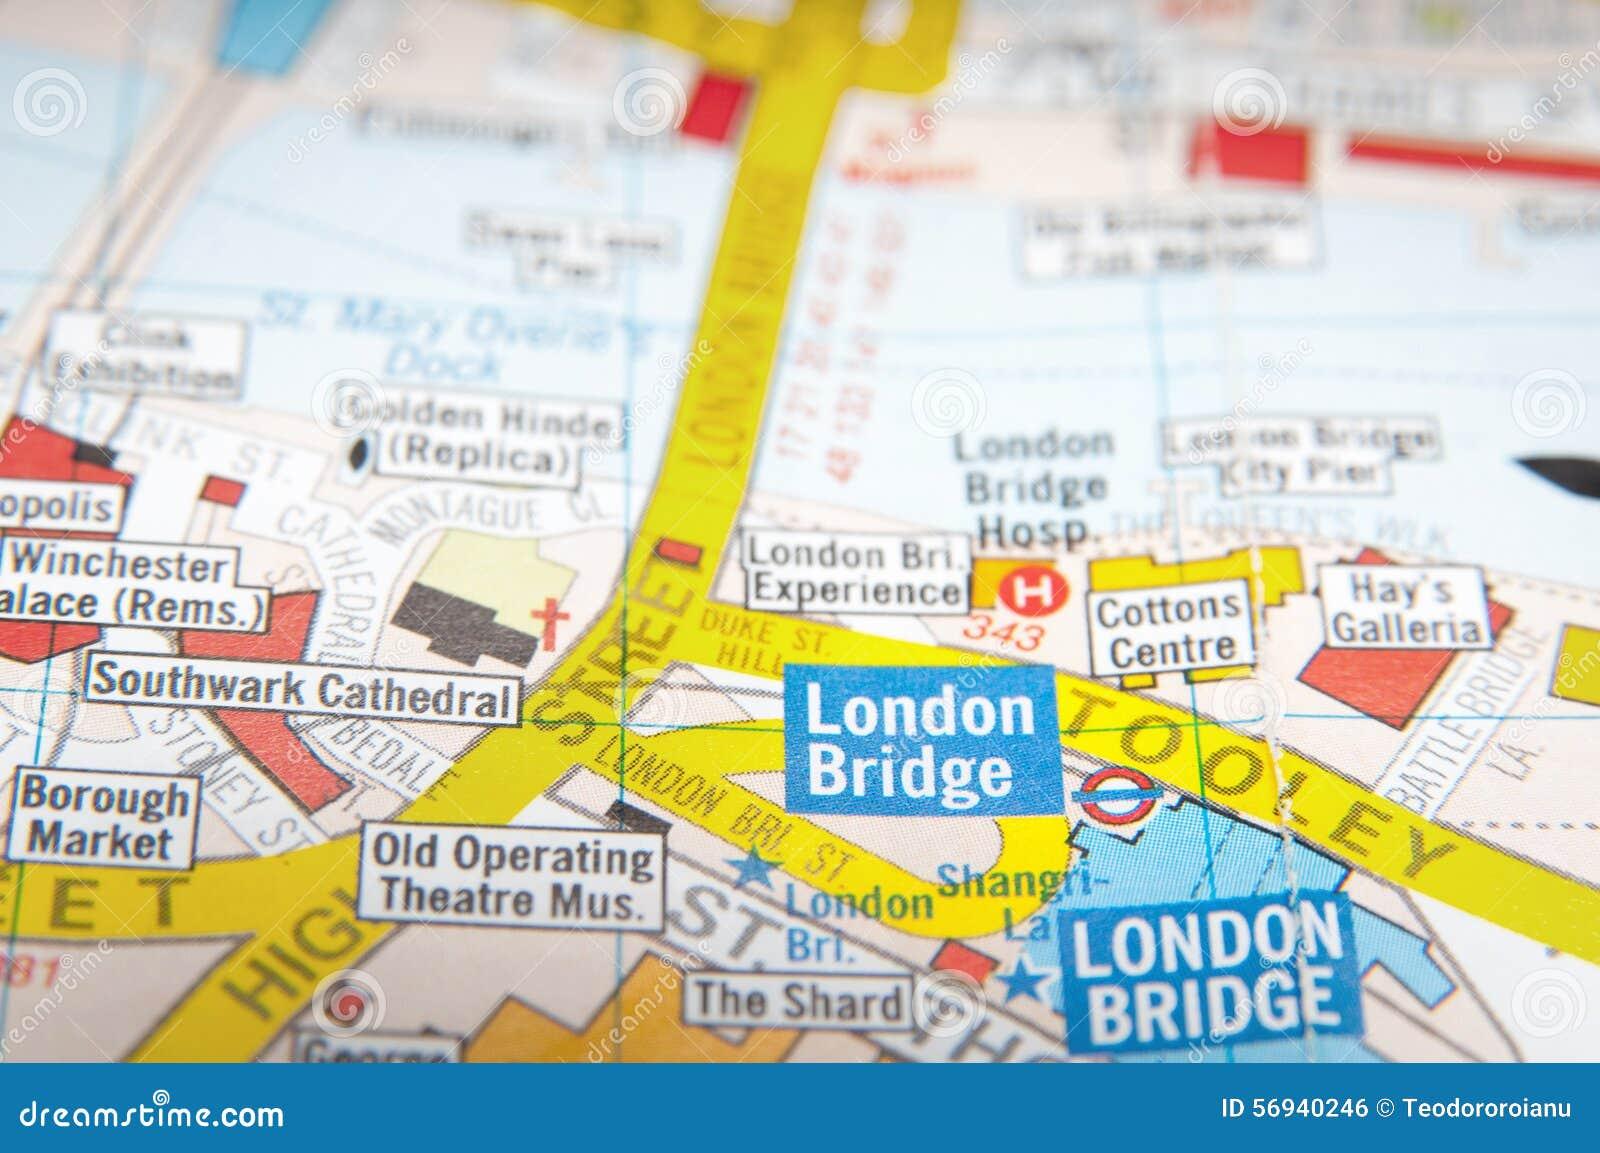 Cartina Stradale Londra.Mappa Stradale Di Londra Fotografia Stock Immagine Di Londra 56940246